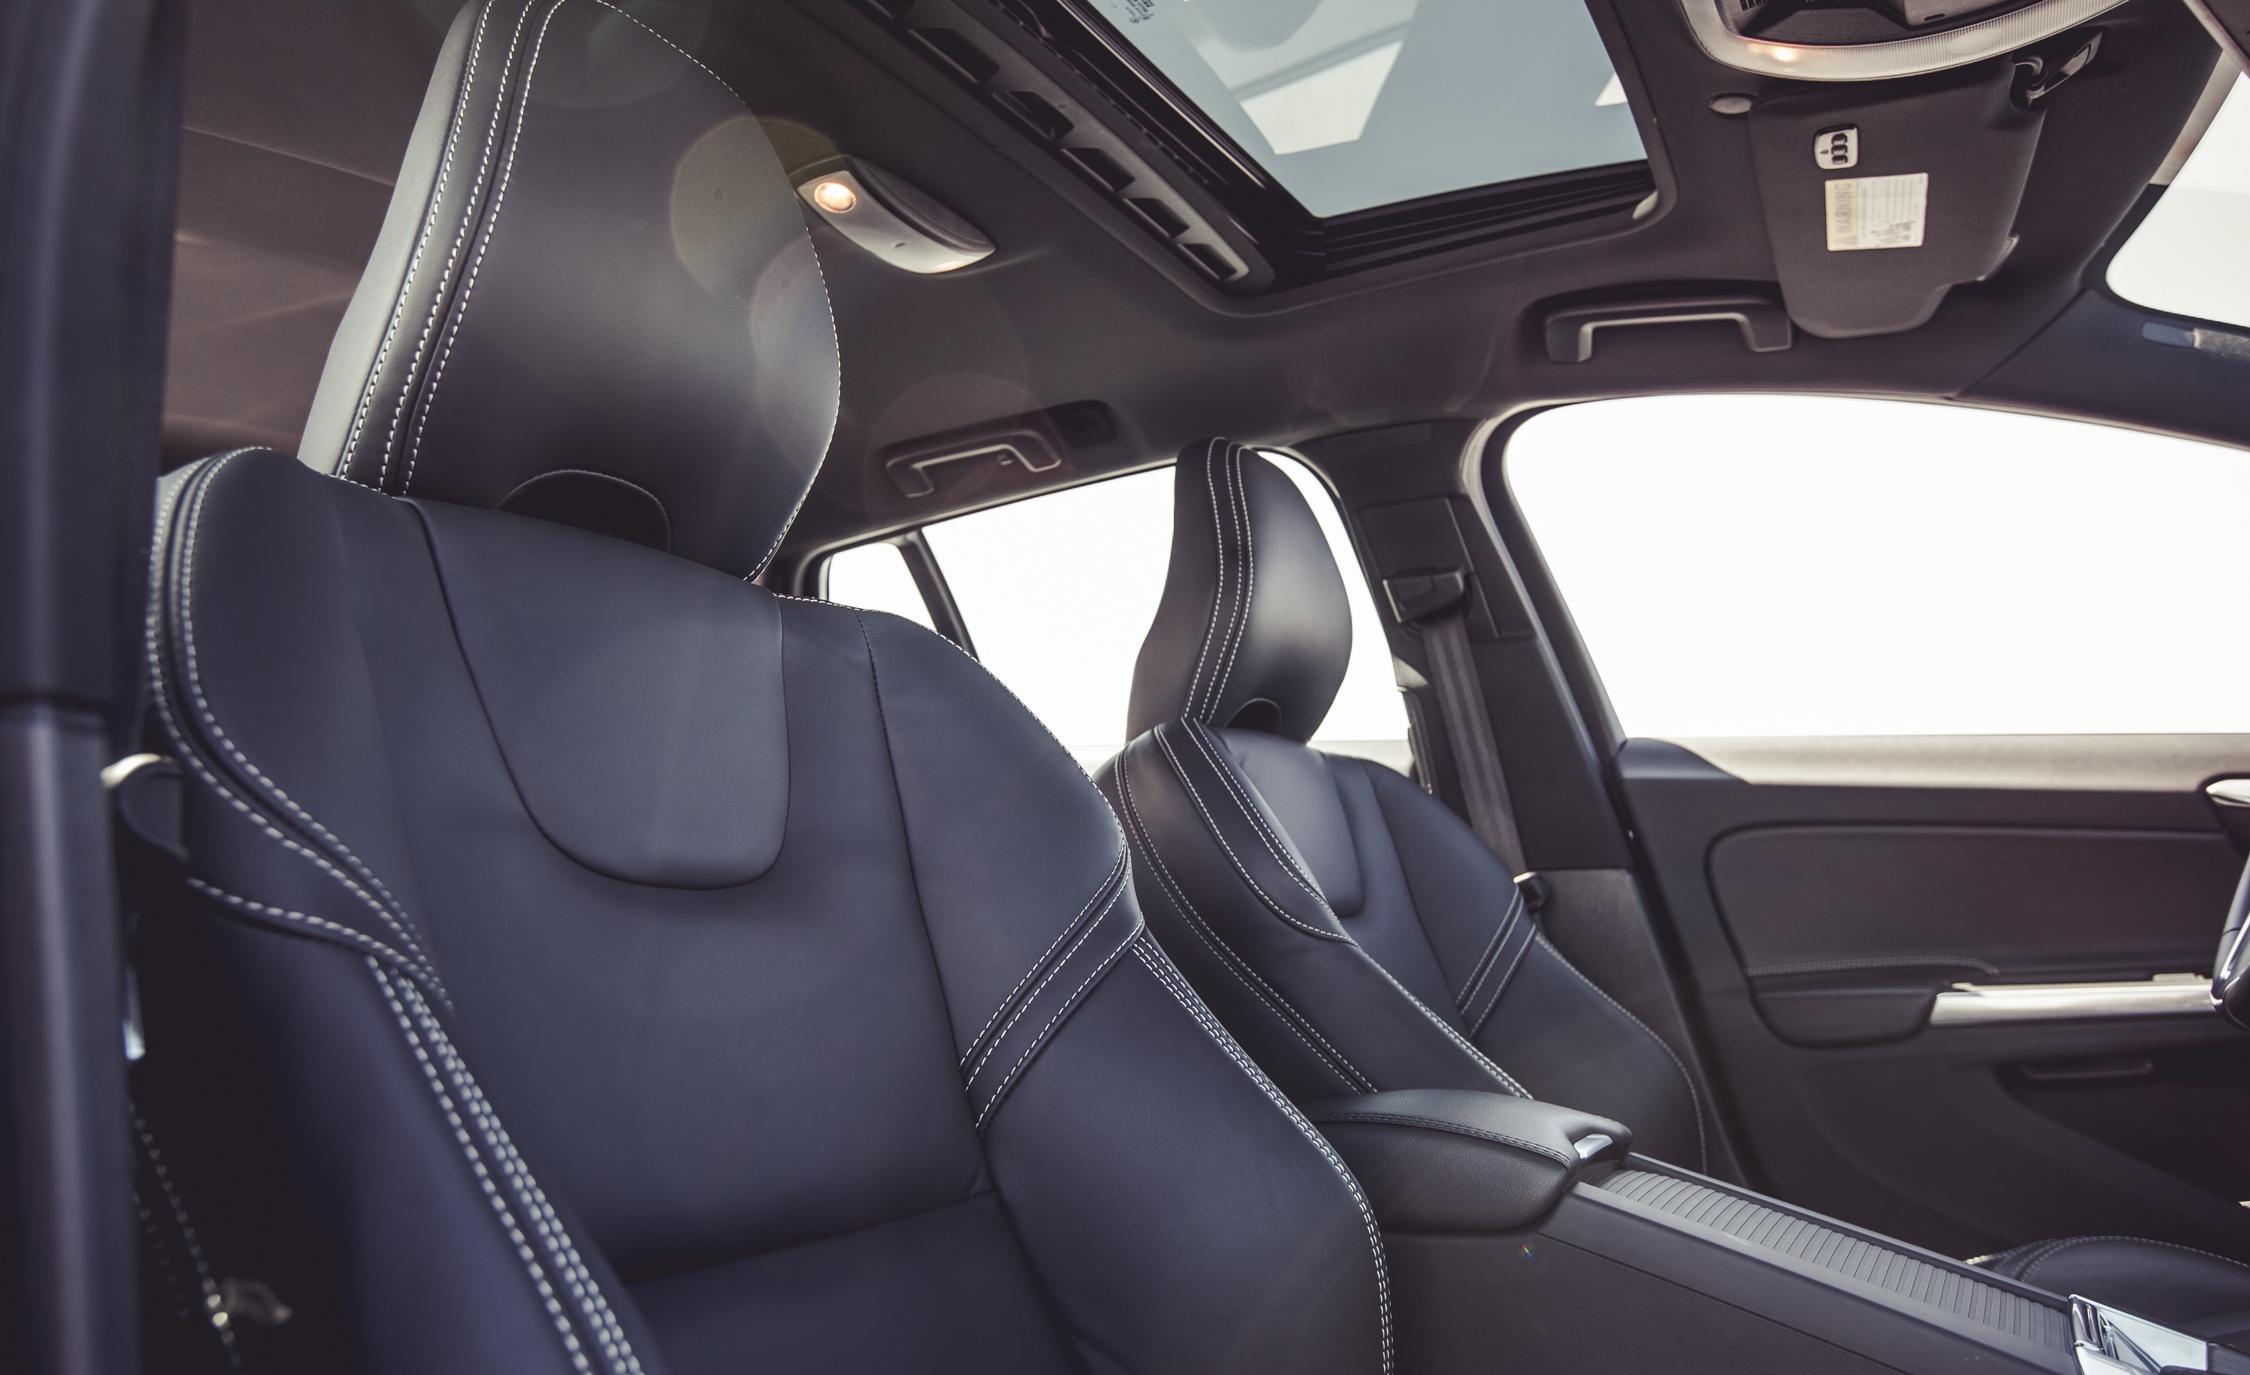 2015 Volvo V60 Interior Front Seats